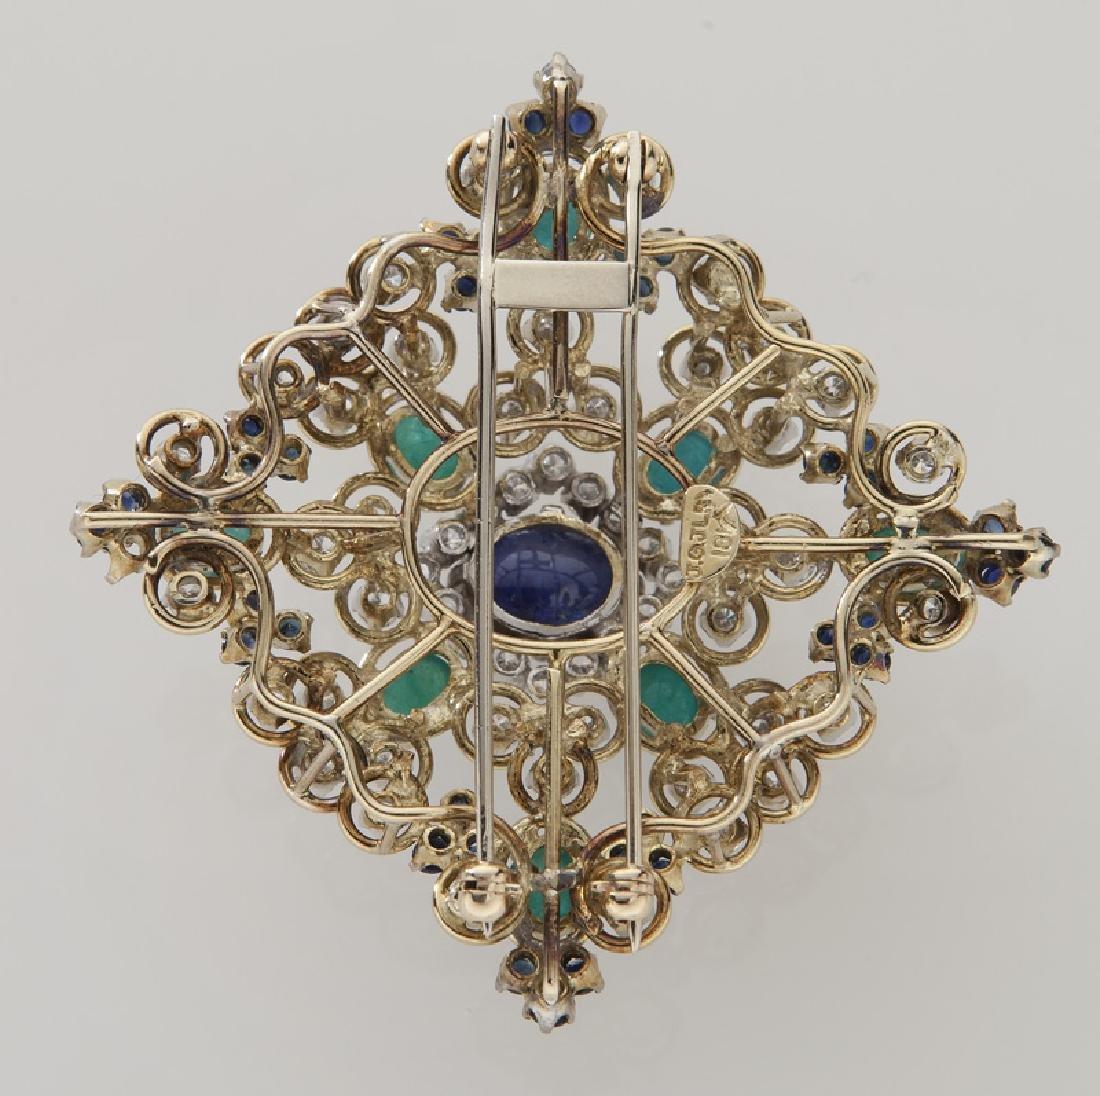 Retro 18K gold, diamond, emerald & sapphire brooch - 2